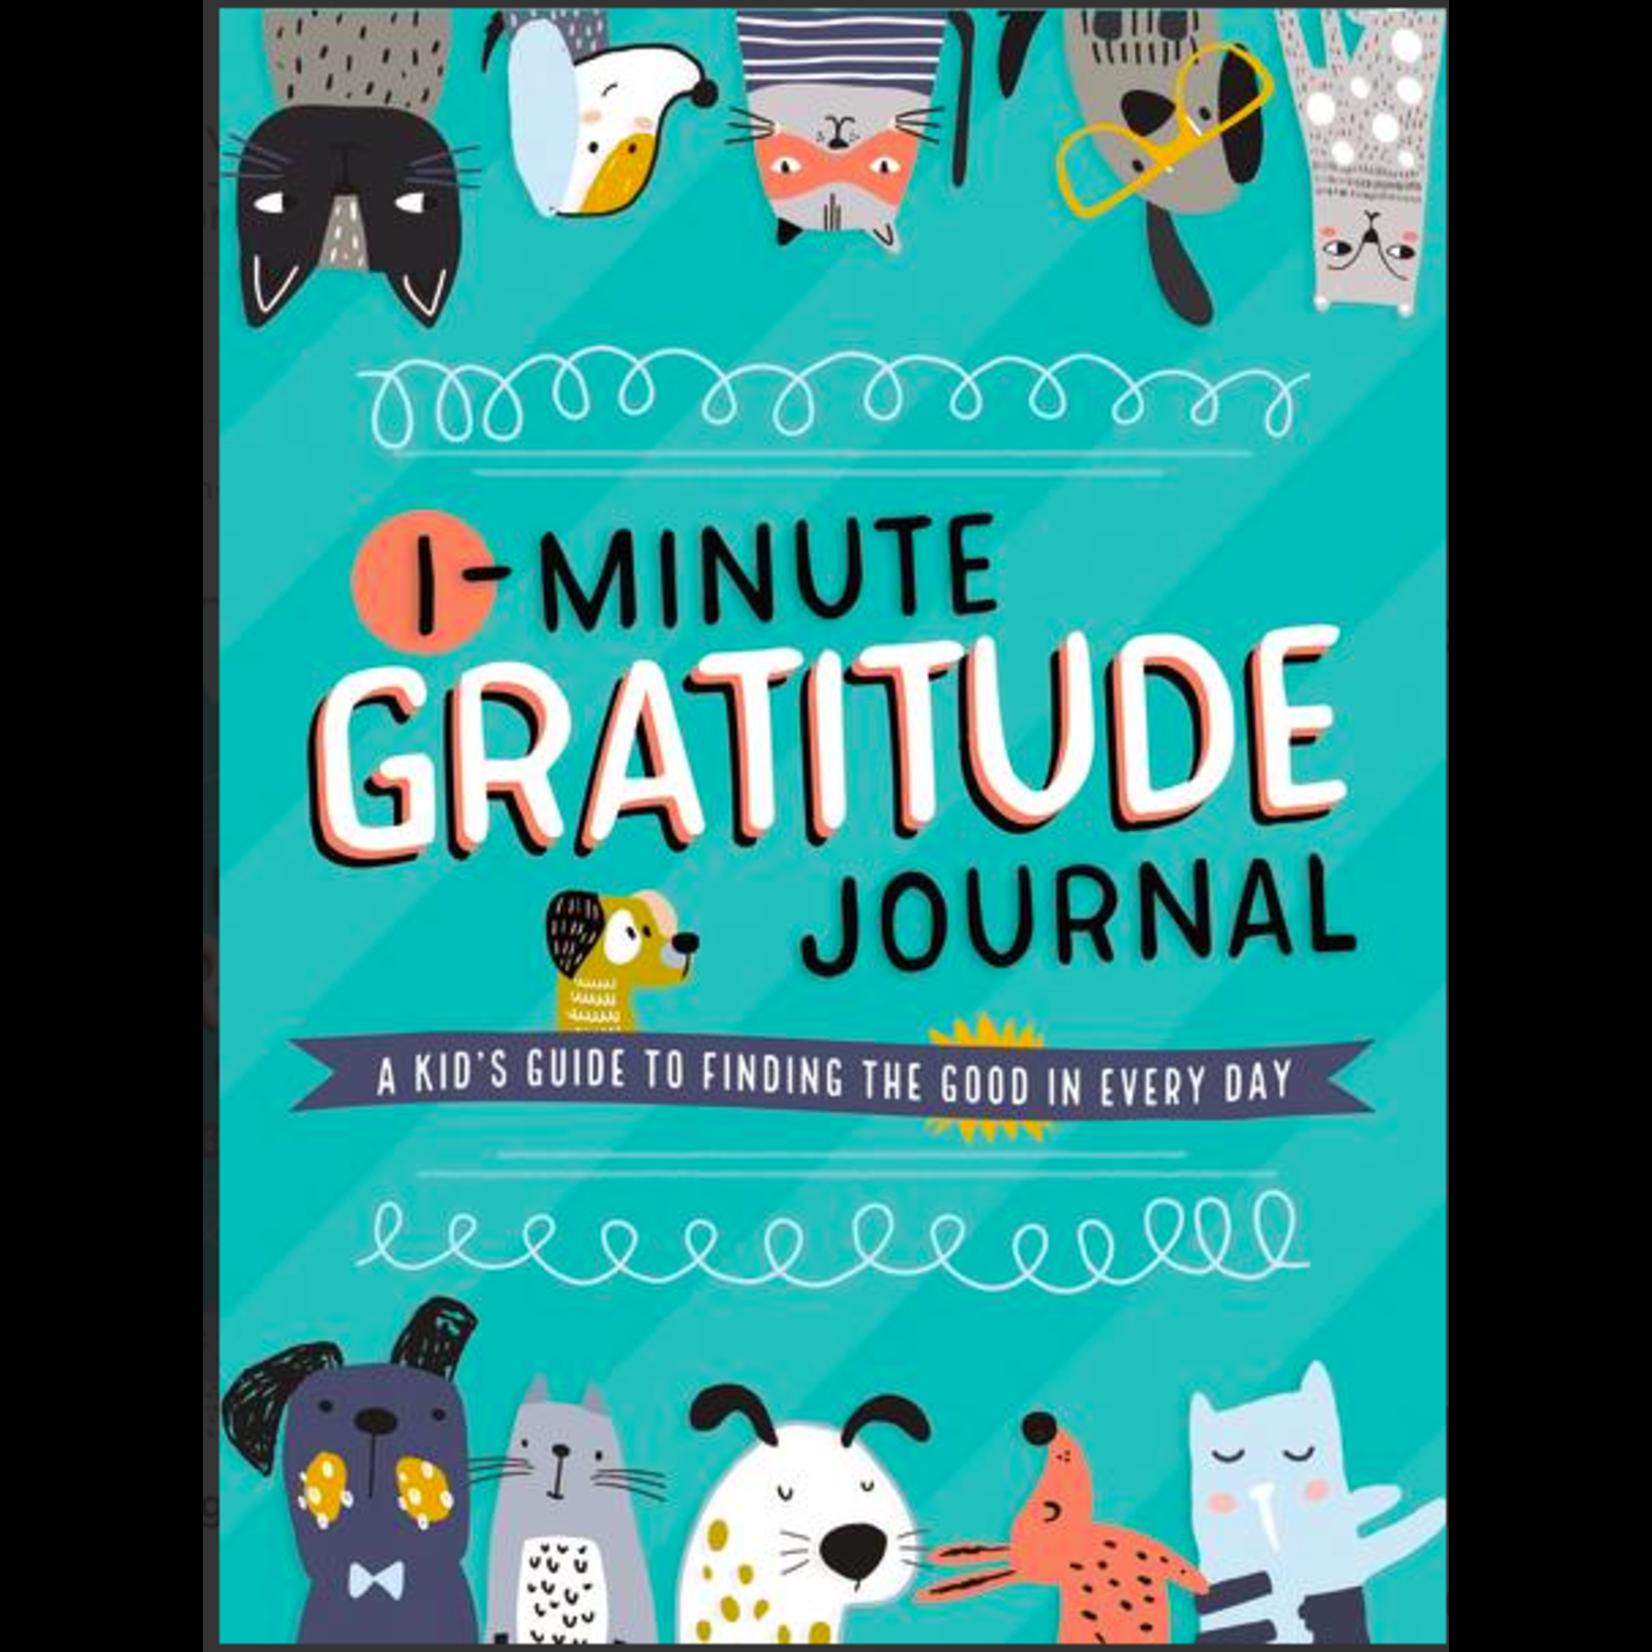 1 Minute Gratitude Journal